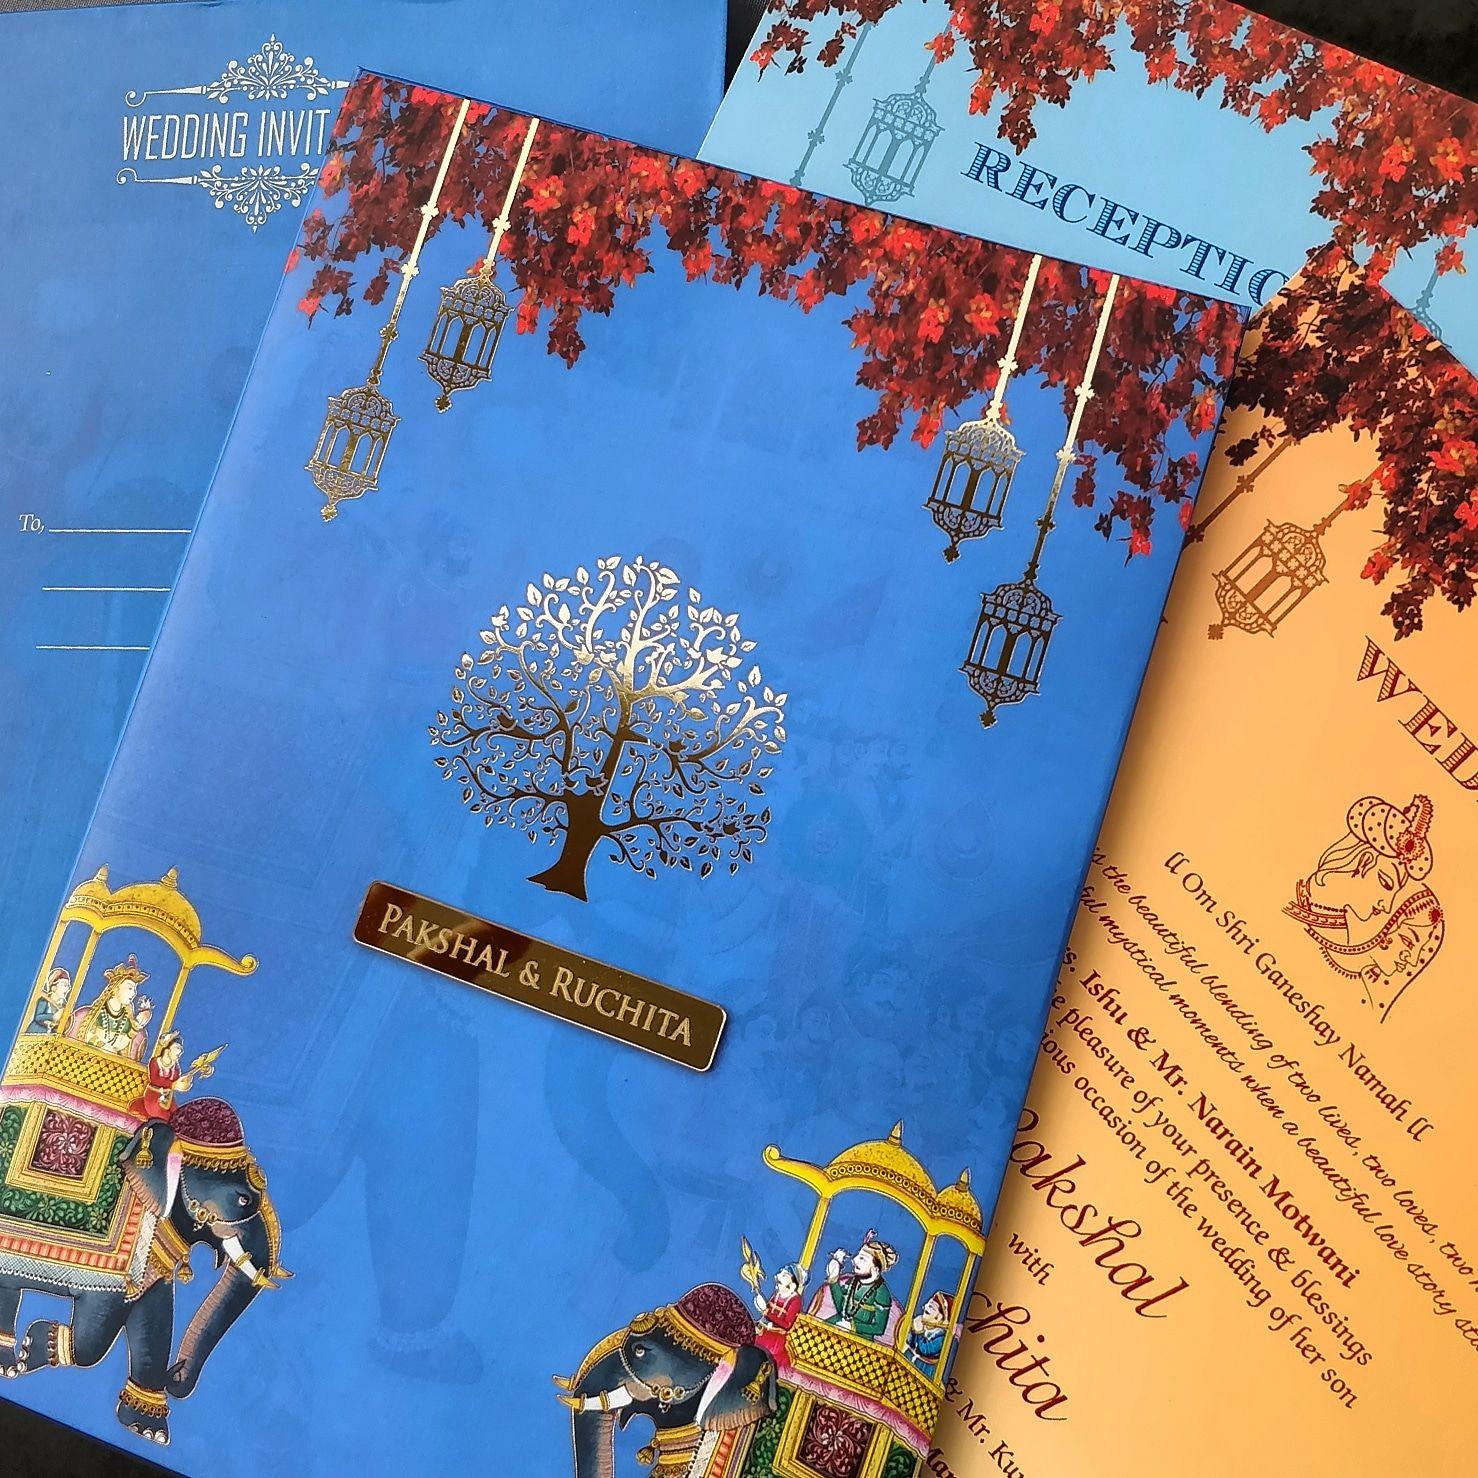 Royal Rajasthani Indian Wedding Invitations Only At Hitched Forever Weddi Indian Wedding Invitation Cards Online Wedding Cards Printing Wedding Invitations